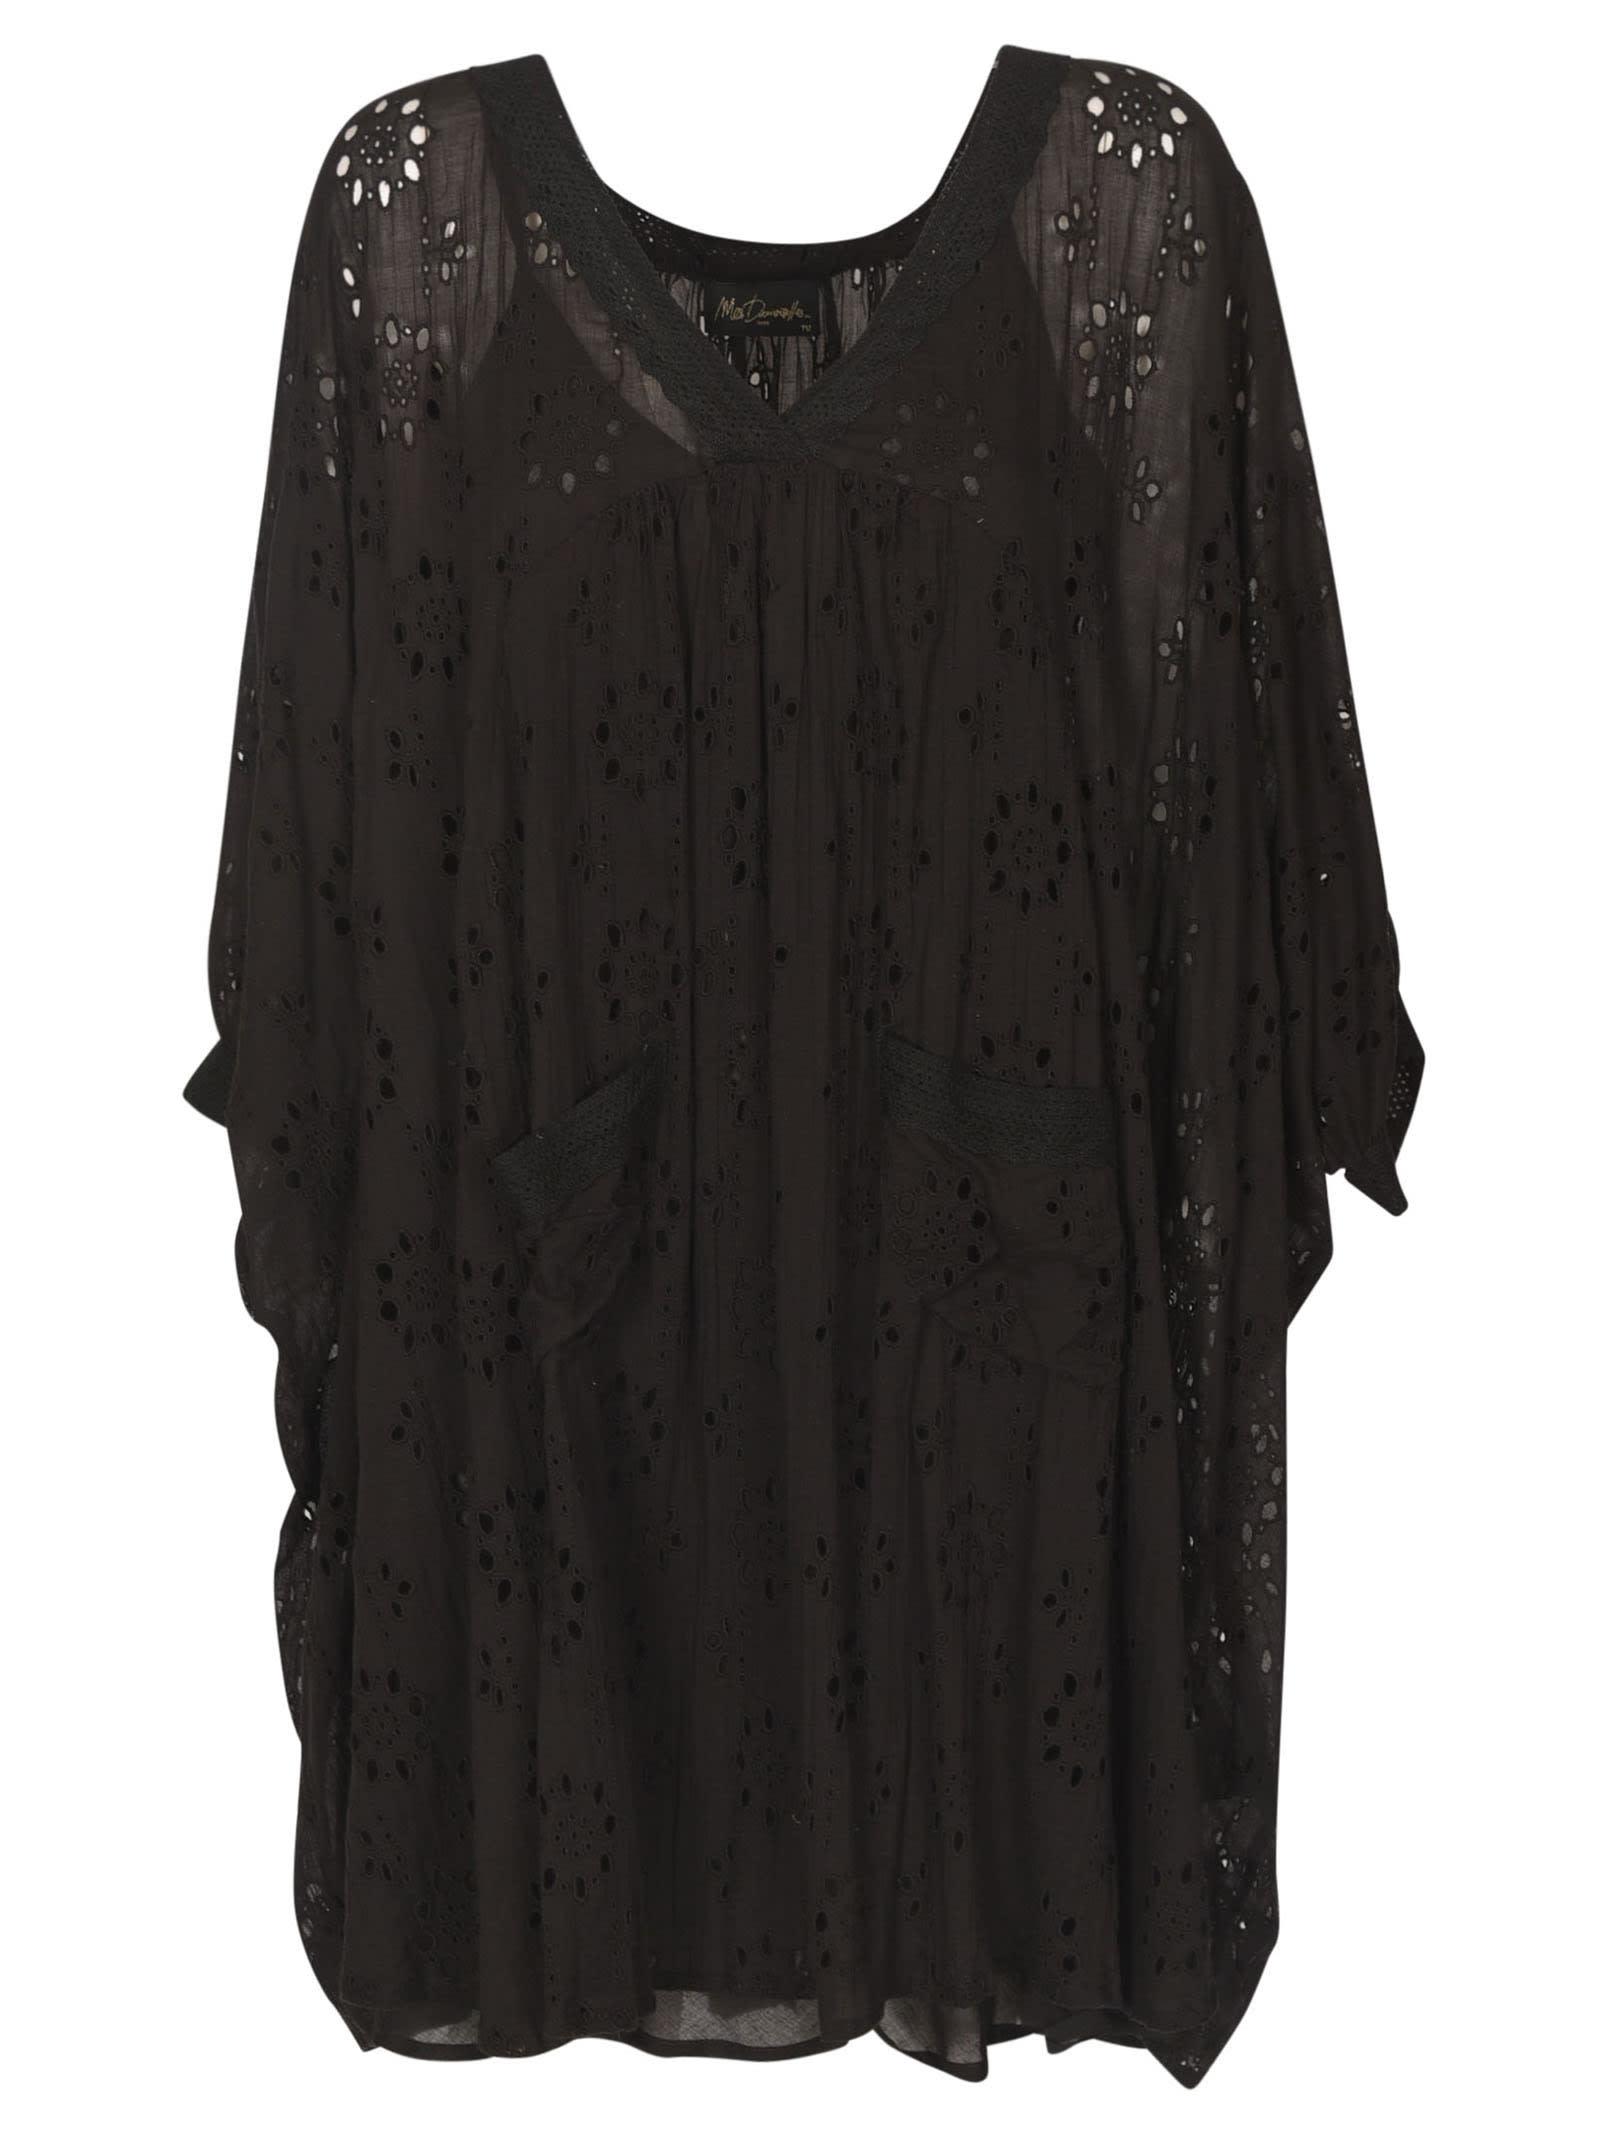 Mes Demoiselles V-neck Perforated Short Dress